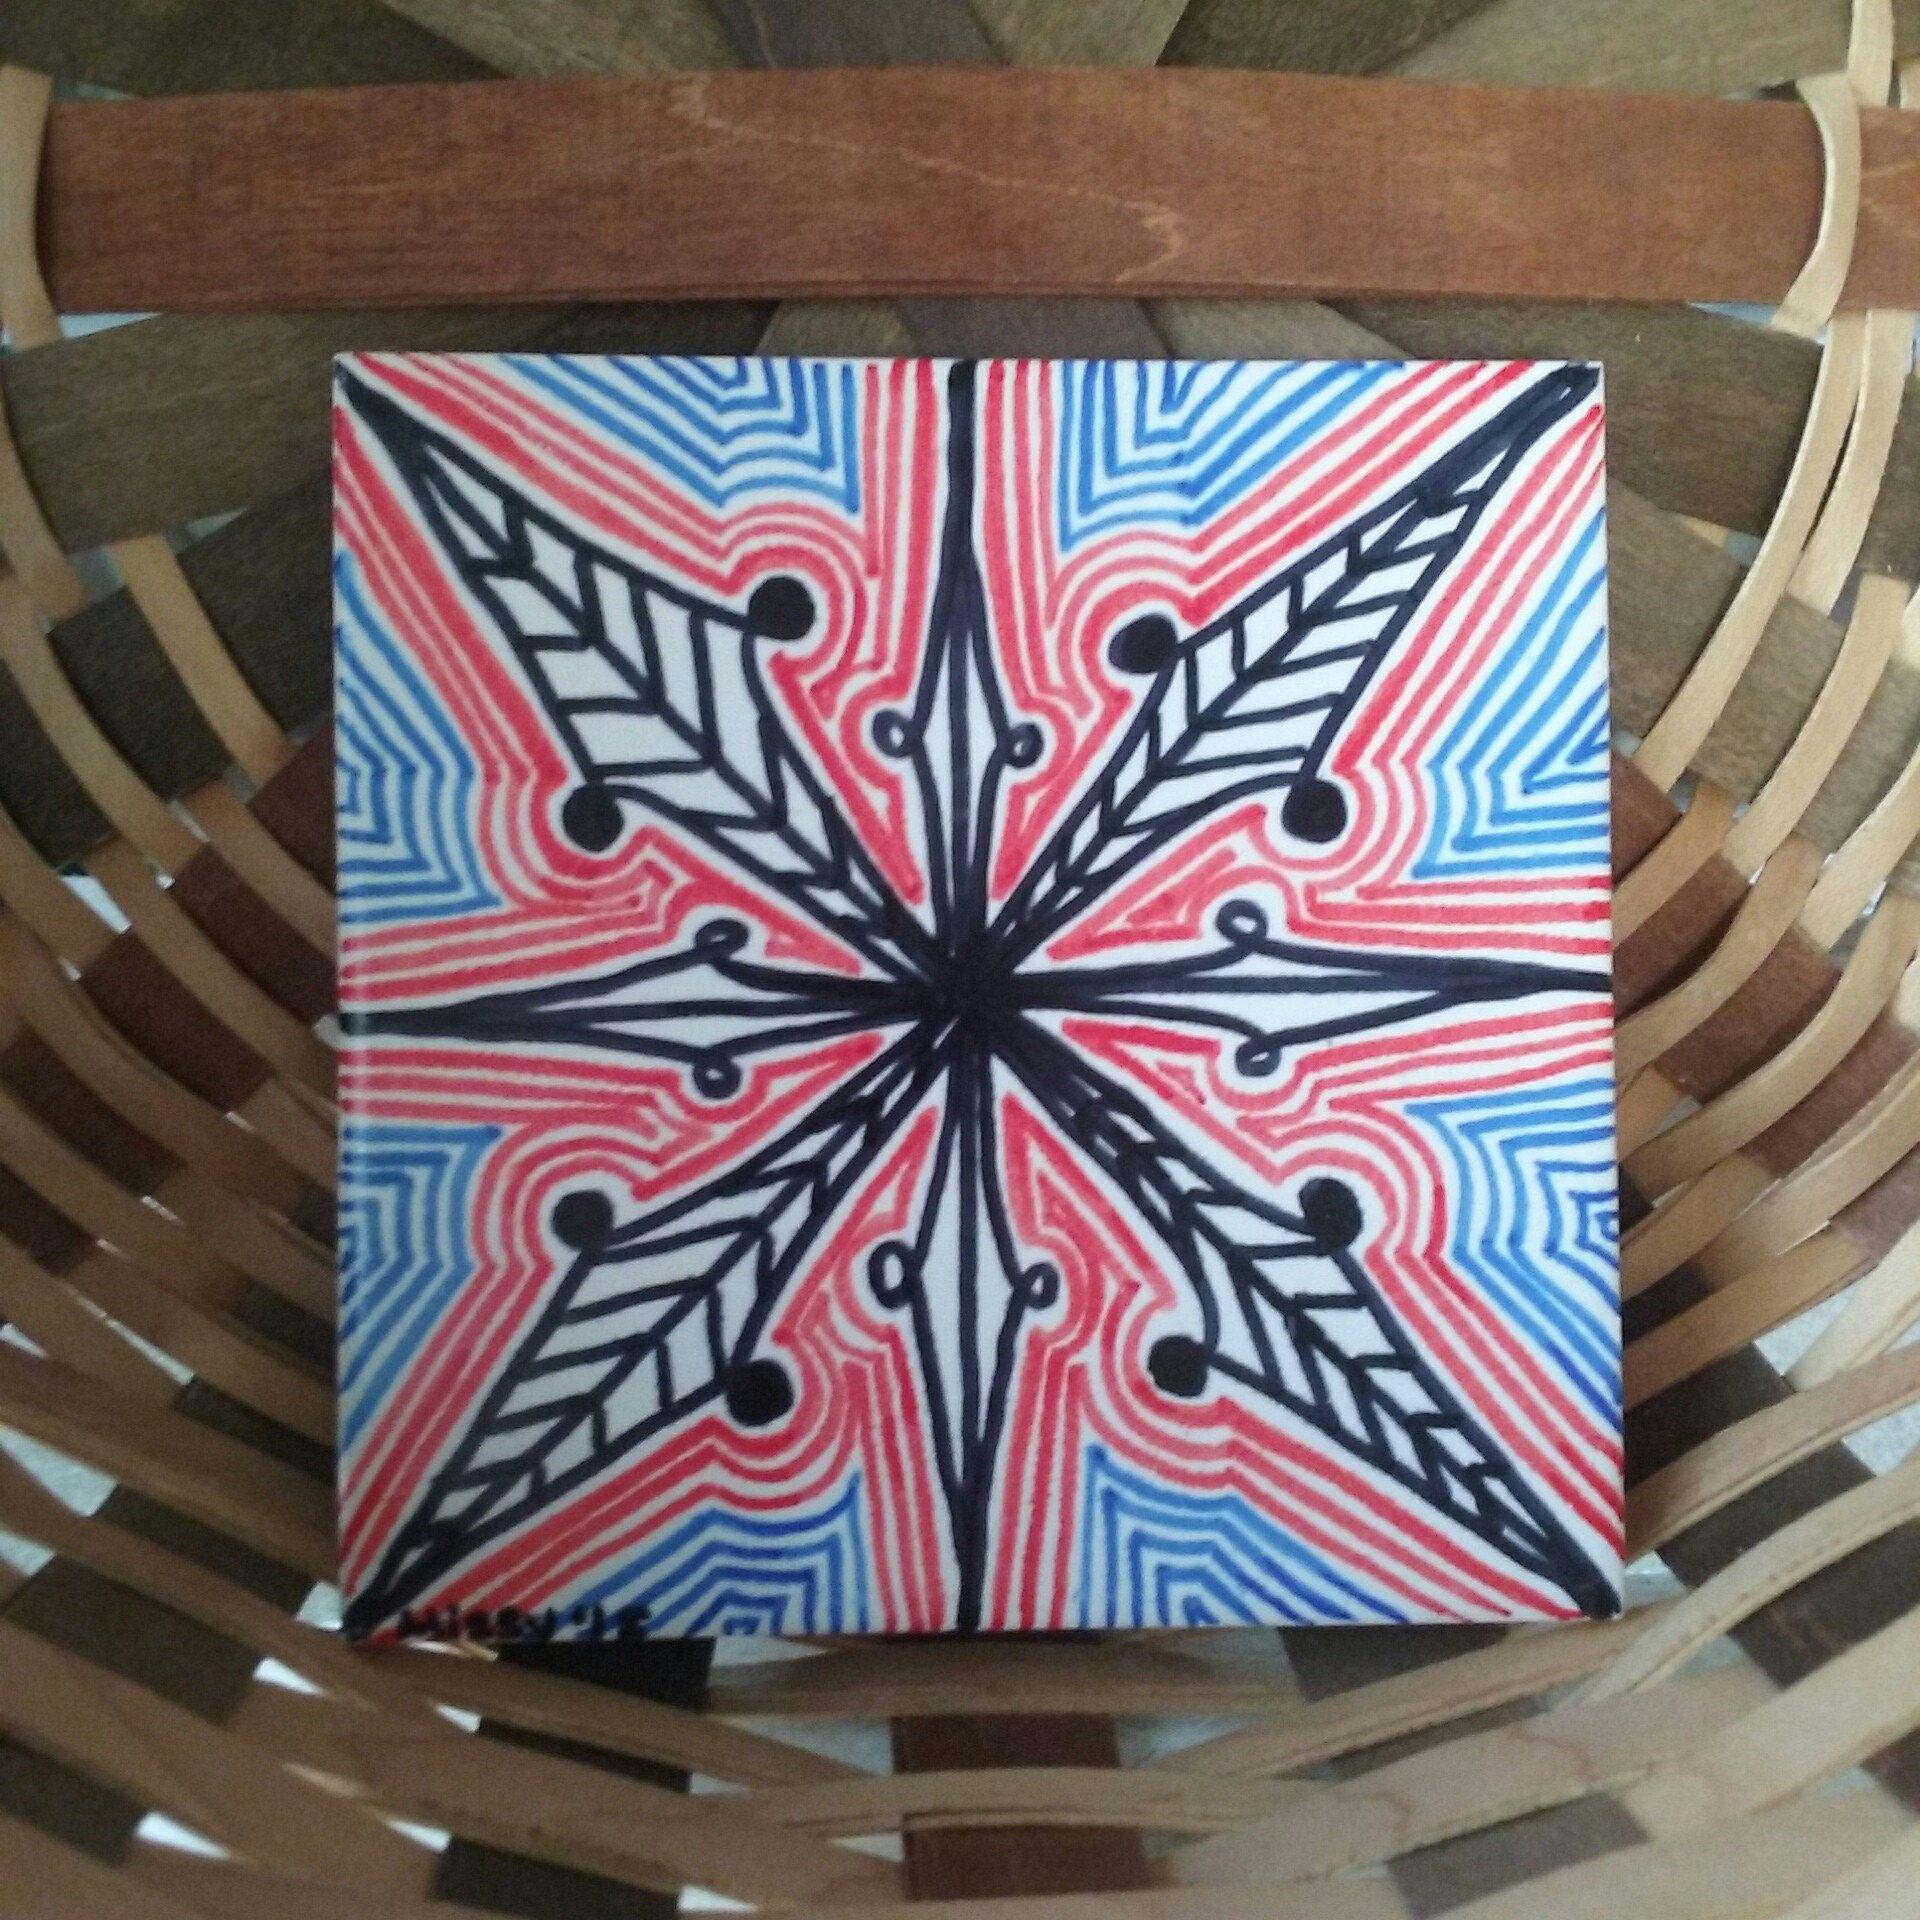 Zentangle inspired sharpie marker art ceramic tile trivet coaster zentangle inspired sharpie marker art ceramic tile trivet coaster doodle tangle pattern artwork for home decor handmade decorative wall art dailygadgetfo Gallery